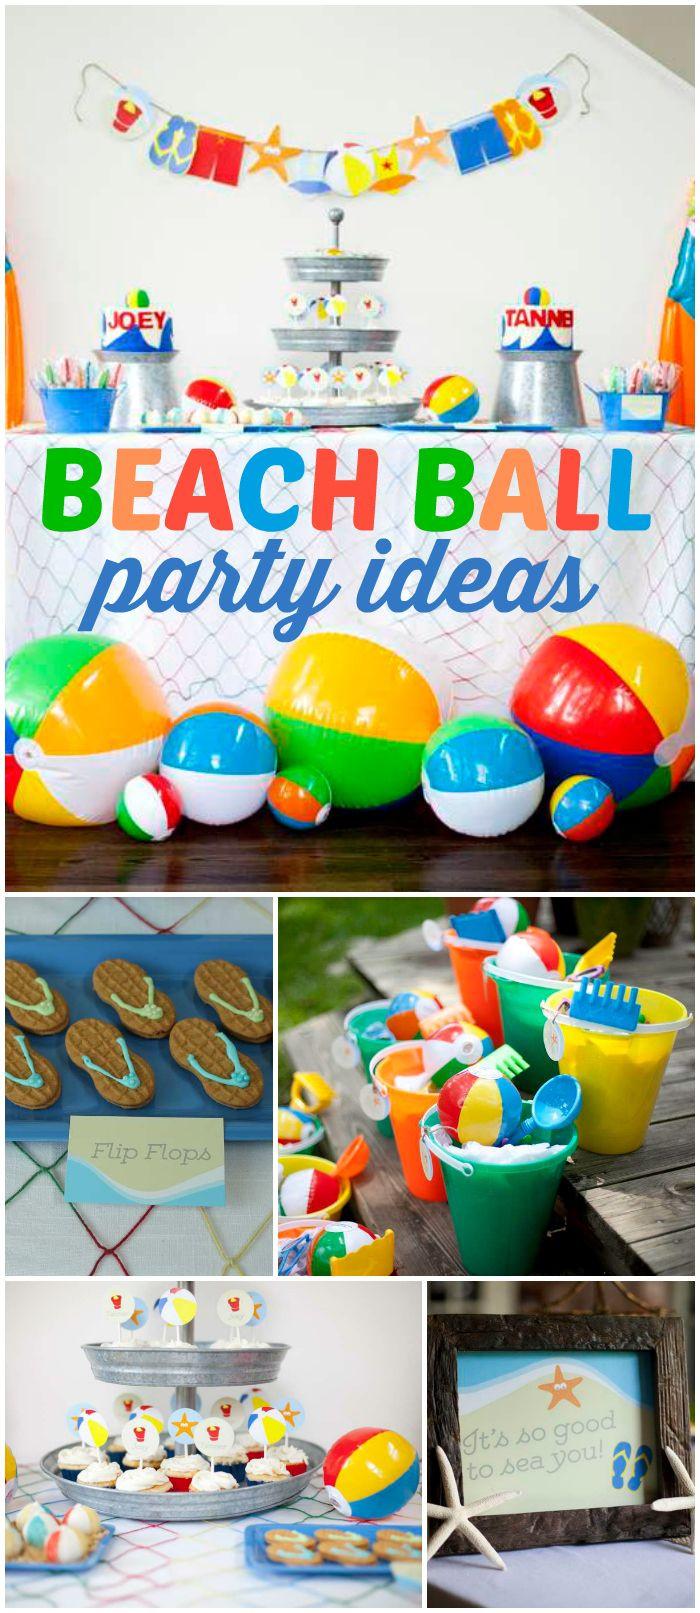 Summer Birthday Party Ideas For Boys  Best 25 Kids beach party ideas on Pinterest